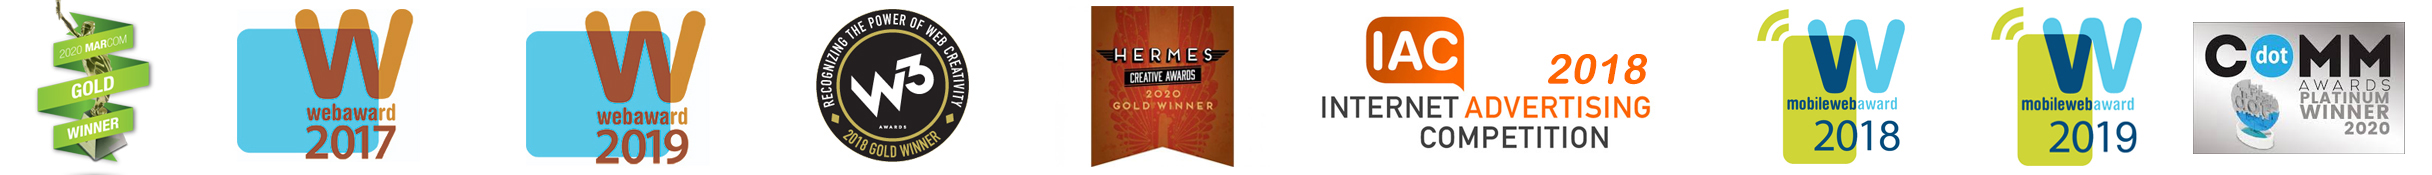 award-logos-new